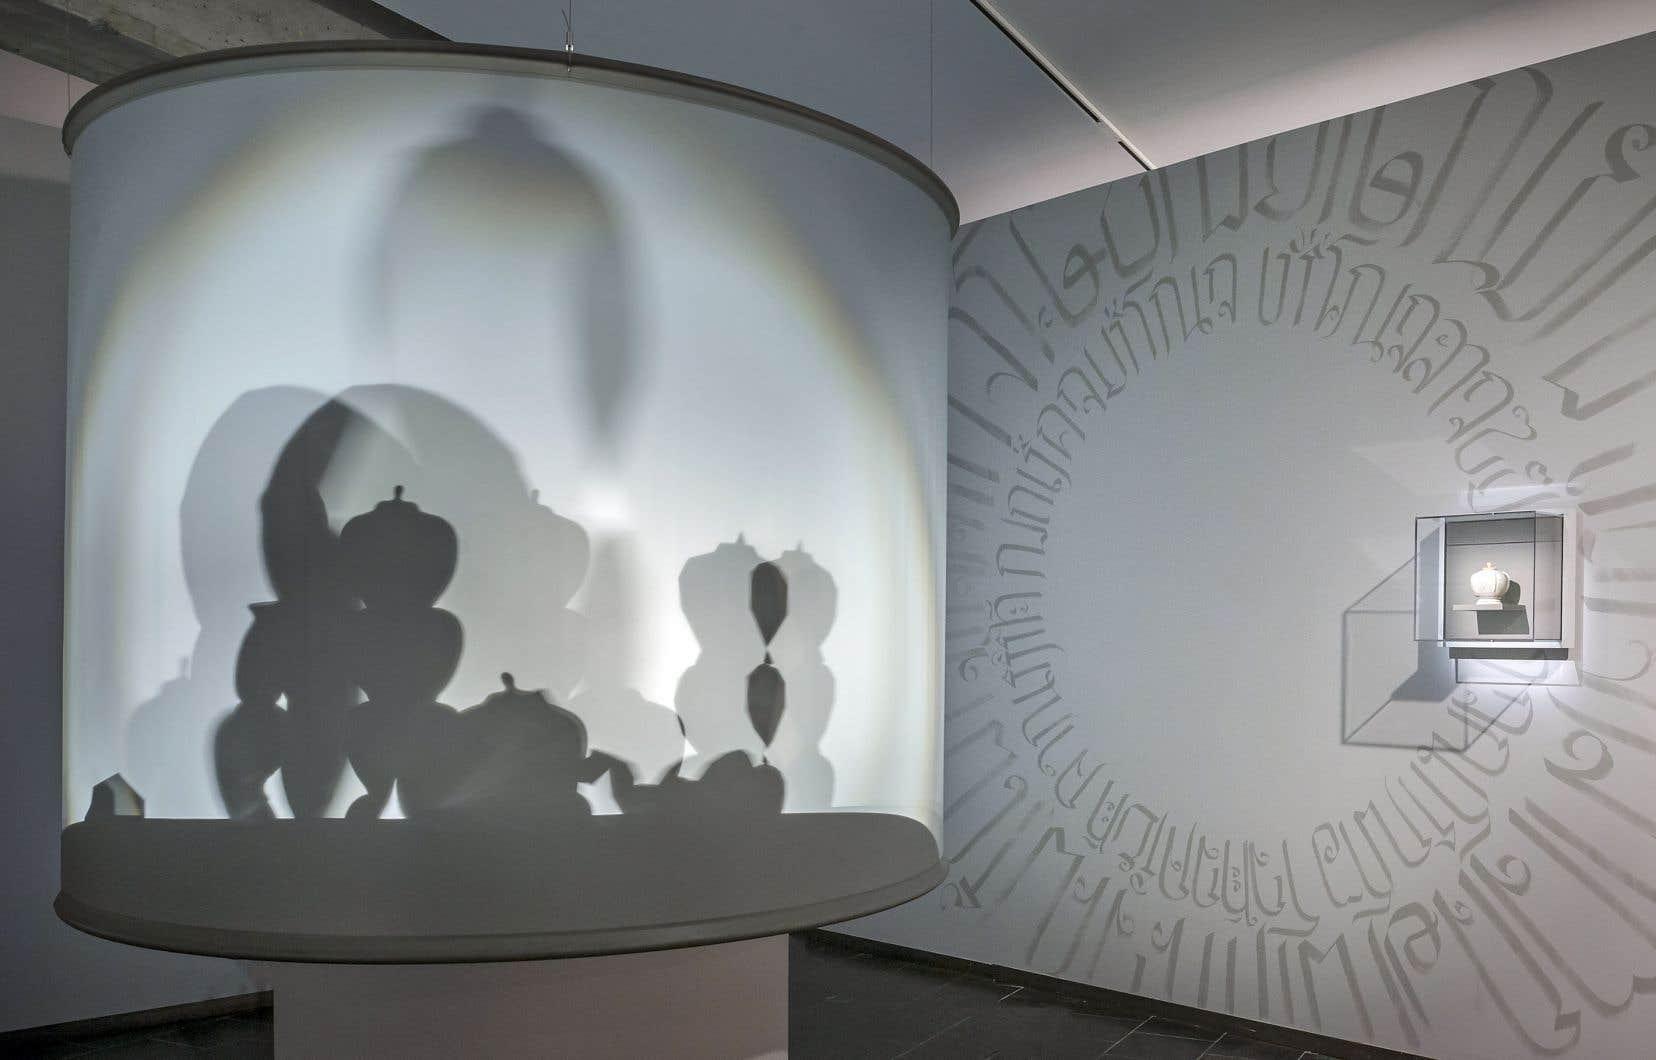 Inspirée de la petite jarre, l'œuvre «Île flottante», de Pavitra Wickramasinghe